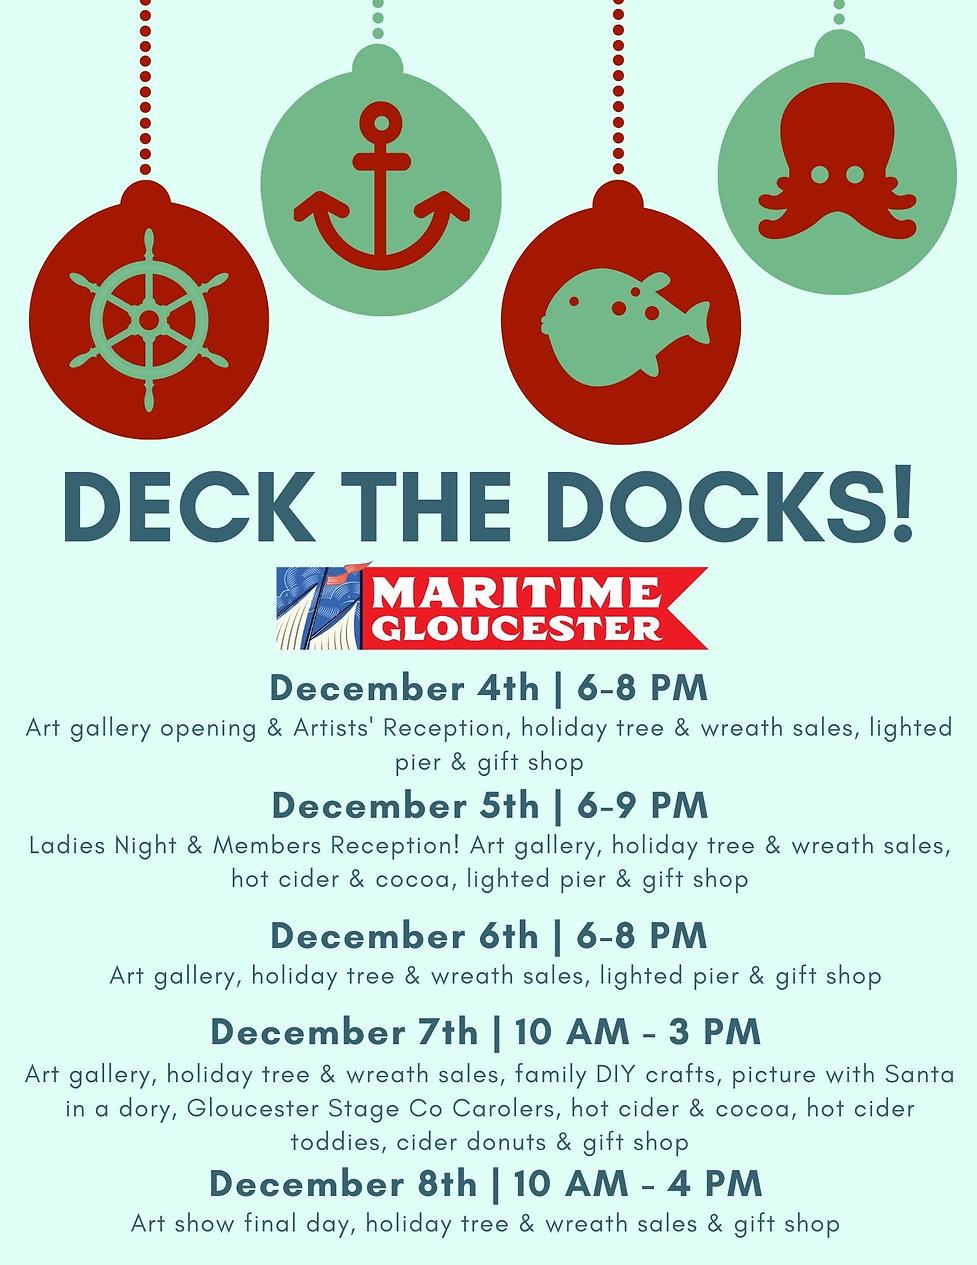 Deck The Docks! Nov 11.jpg